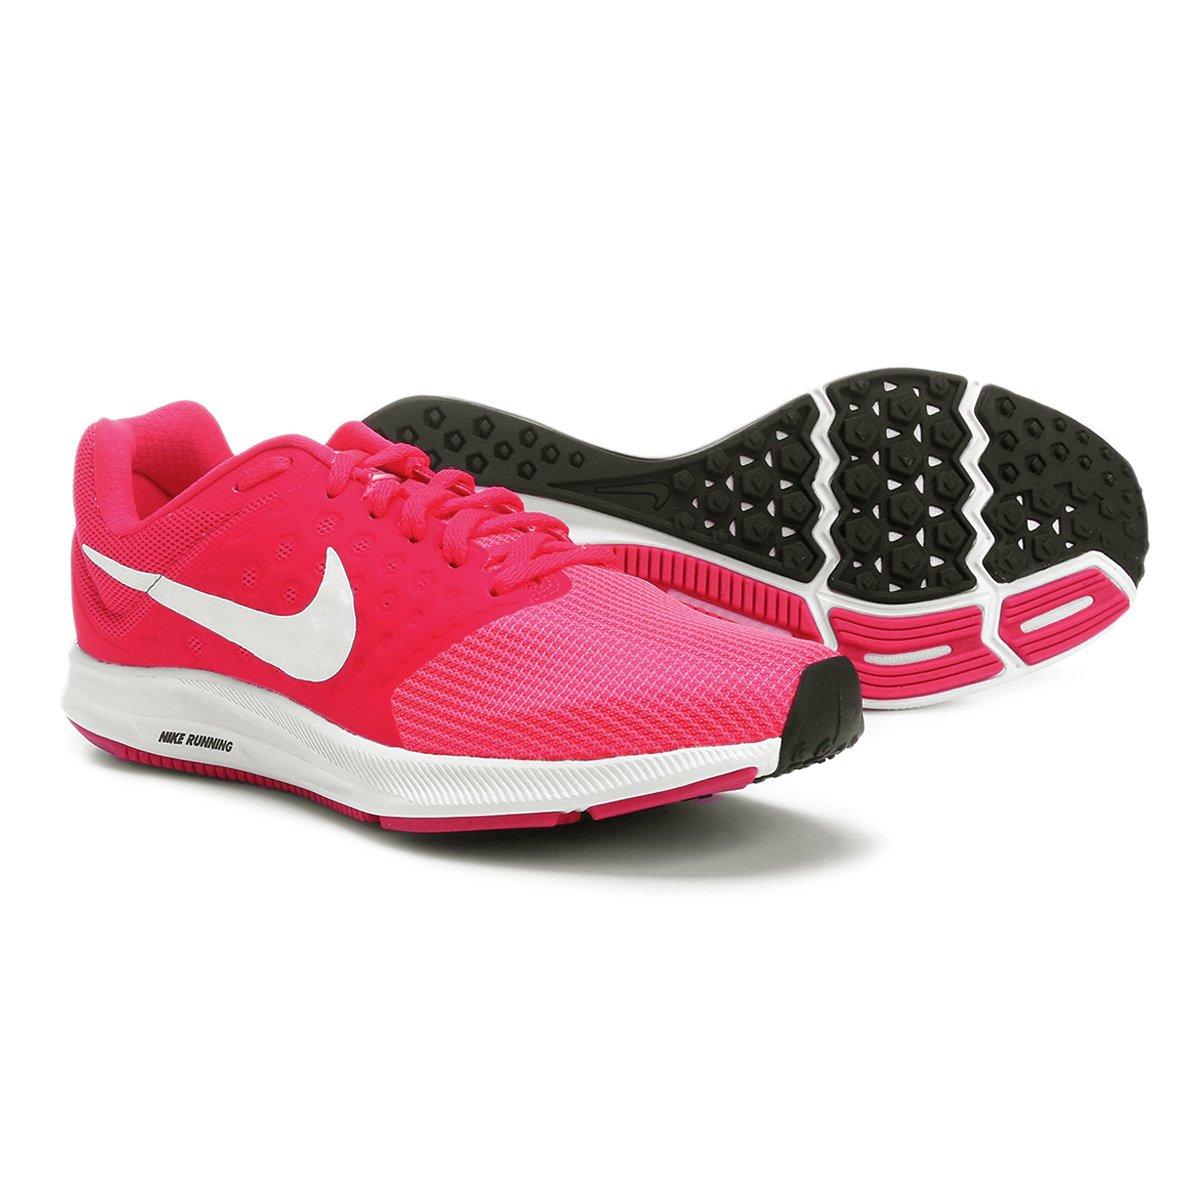 4f1ba09ccbb Tênis Nike Downshifter 7 Feminino - Rosa Escuro e Branco - Compre Agora